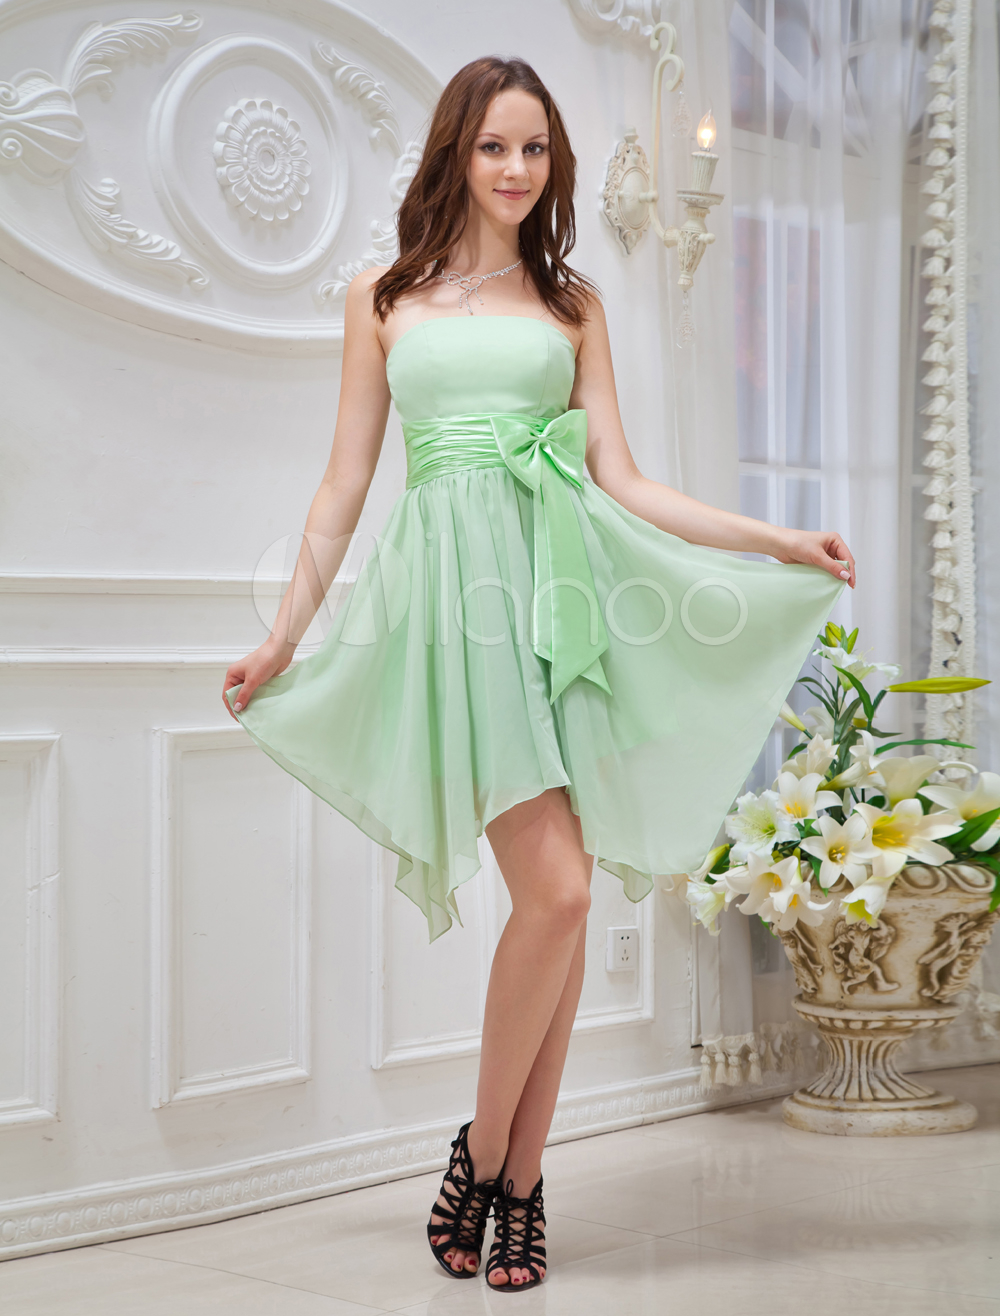 Green Asymmetrical Hemline Bow Chiffon Prom Dress (Wedding Cheap Party Dress) photo